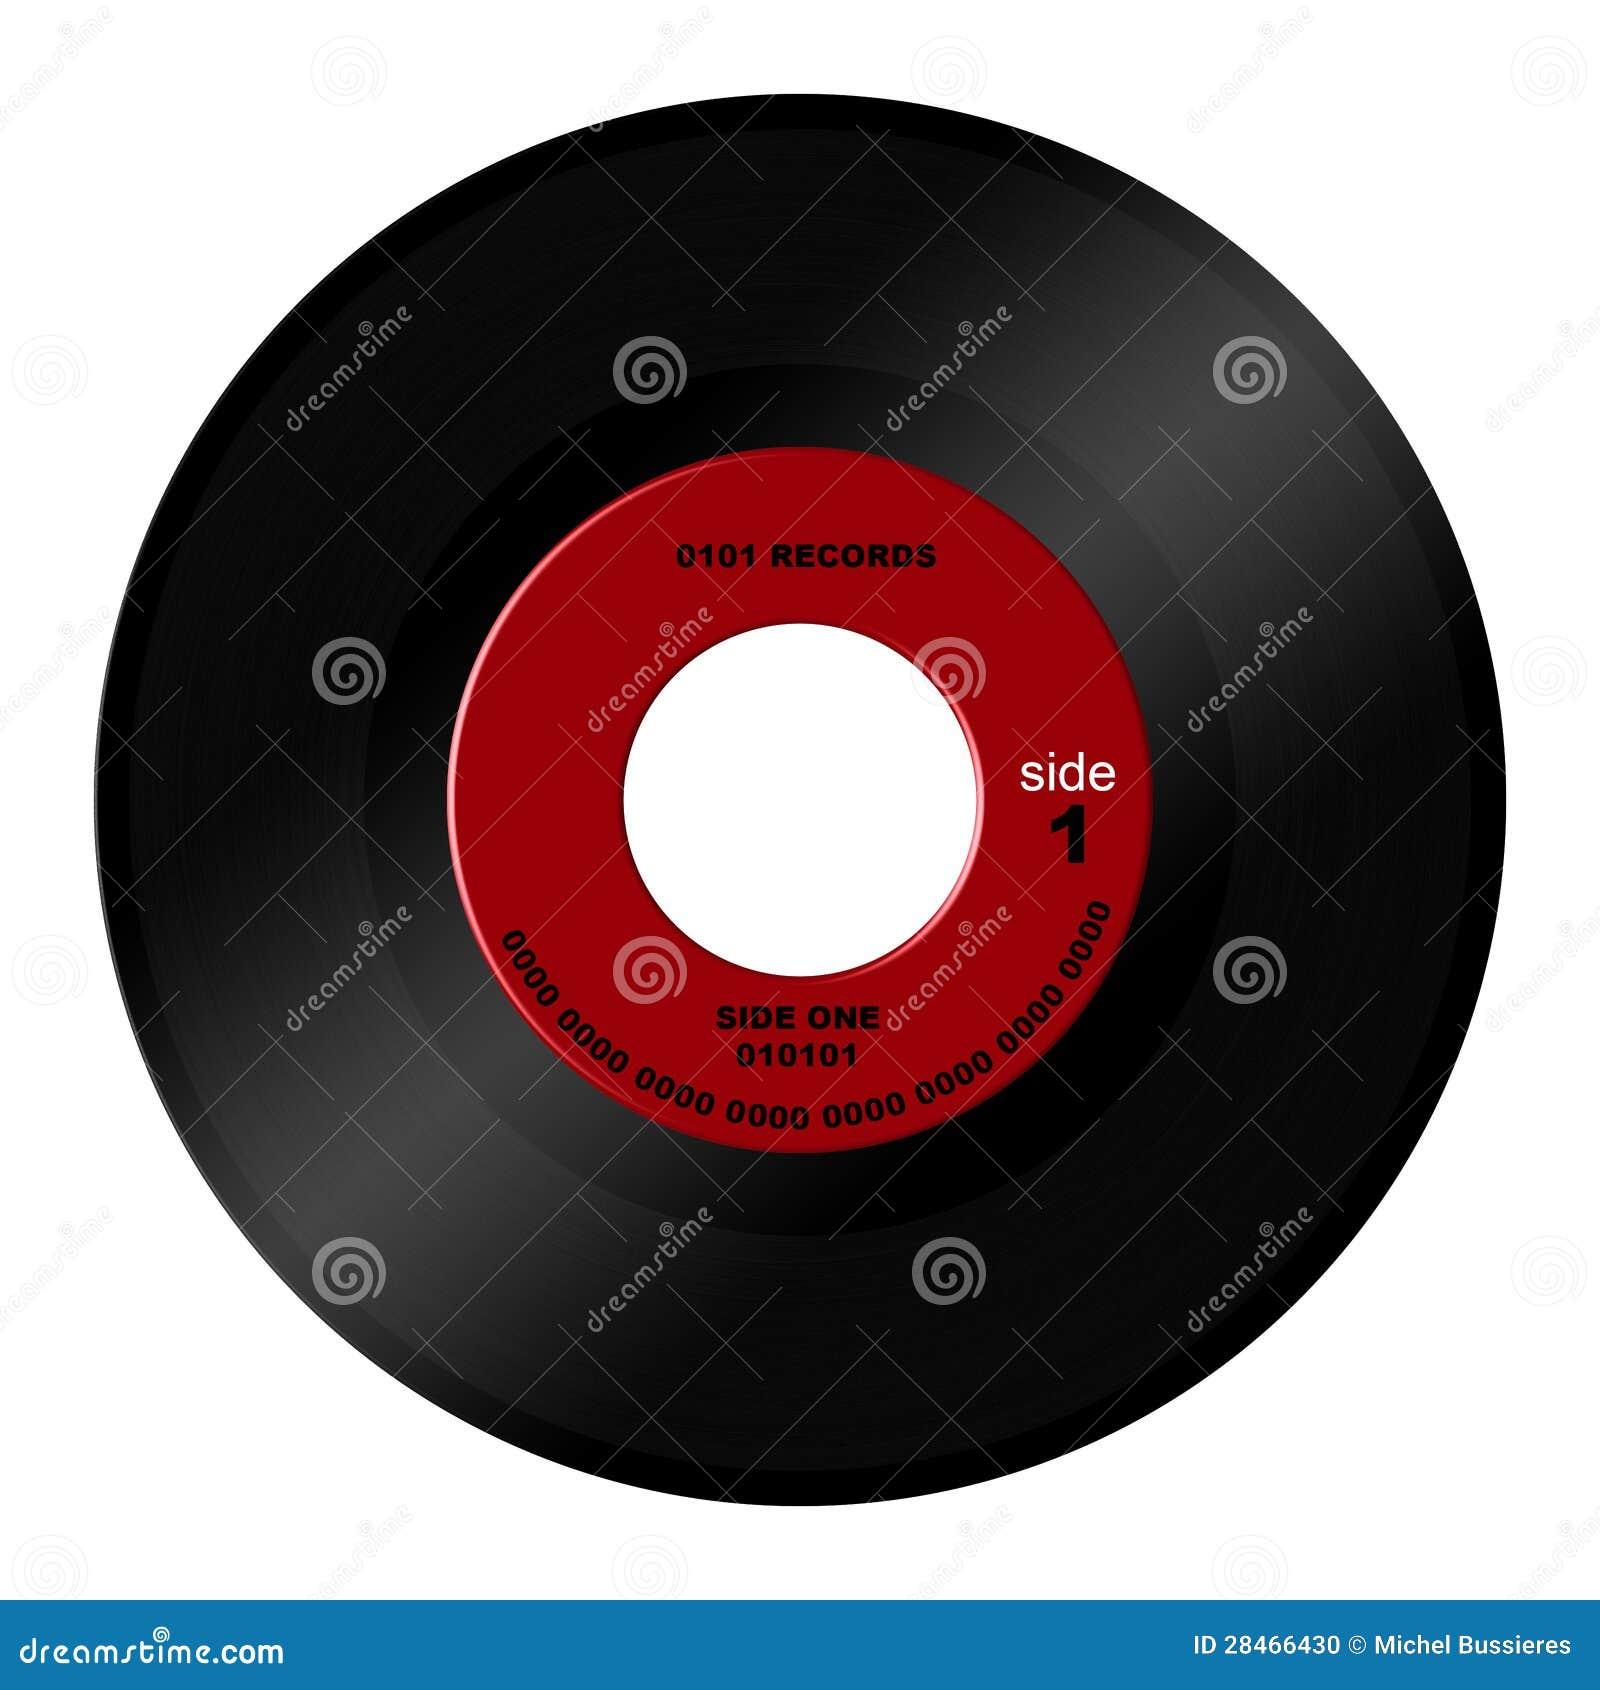 45 Rpm Record Stock Photo Illustration Of Classic Music